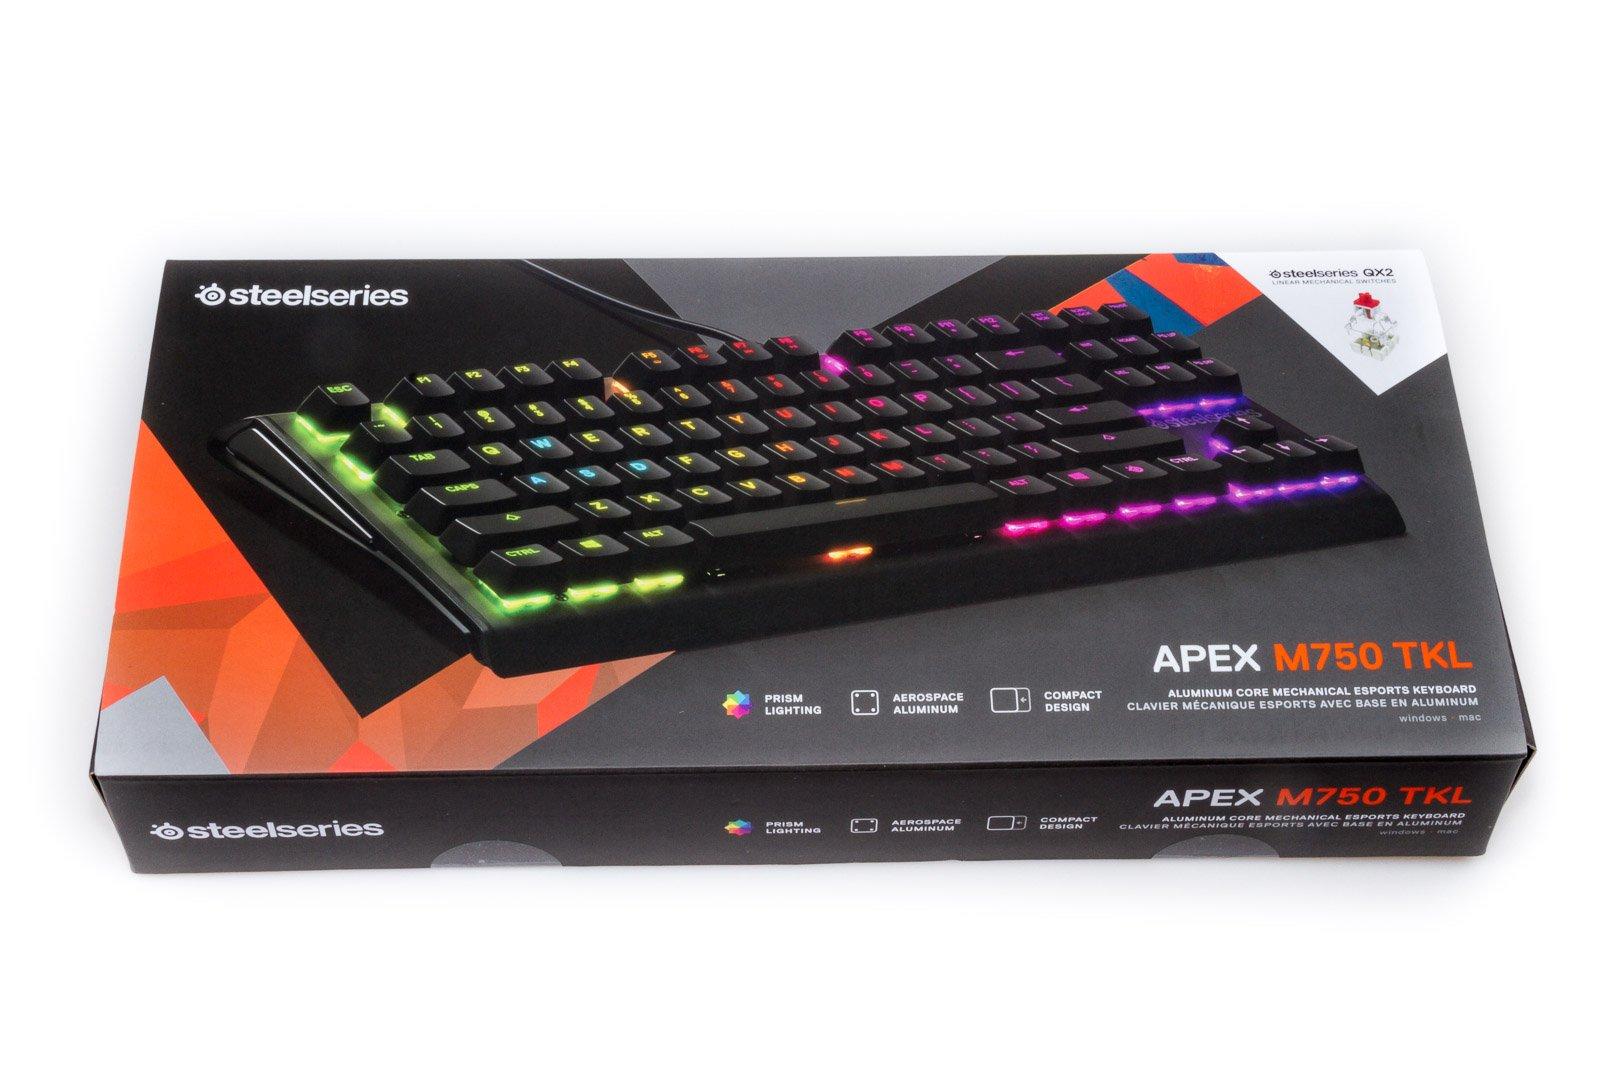 37a9903955e SteelSeries Apex M750 TKL Mechanical Keyboard Review - ProSettings.com